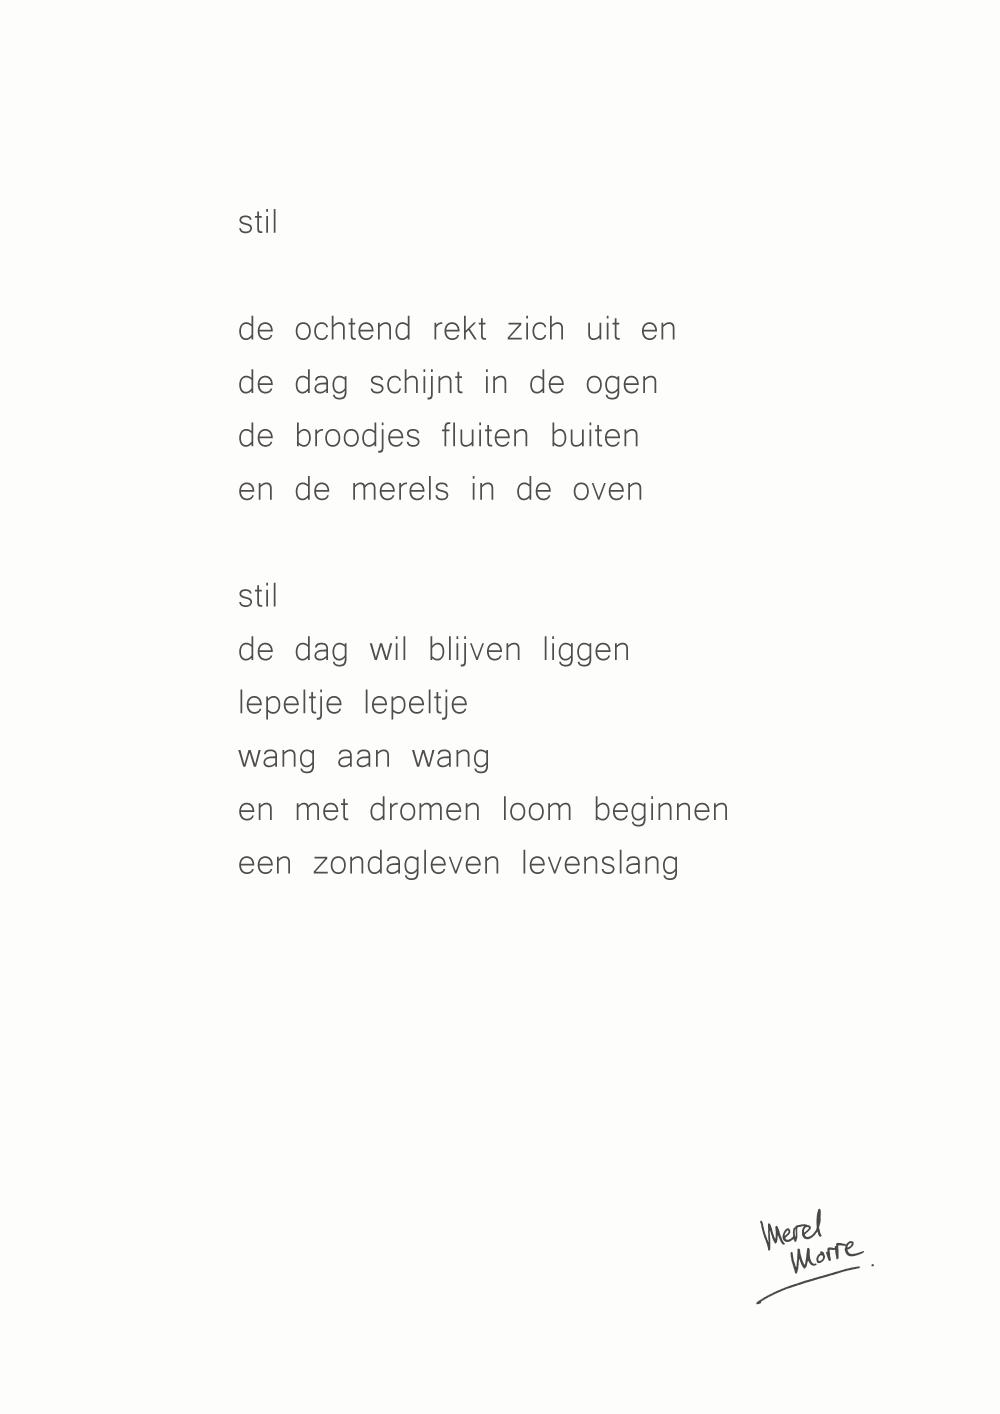 Merel Morre Dichter En Tekstschrijver Woont In Eindhoven